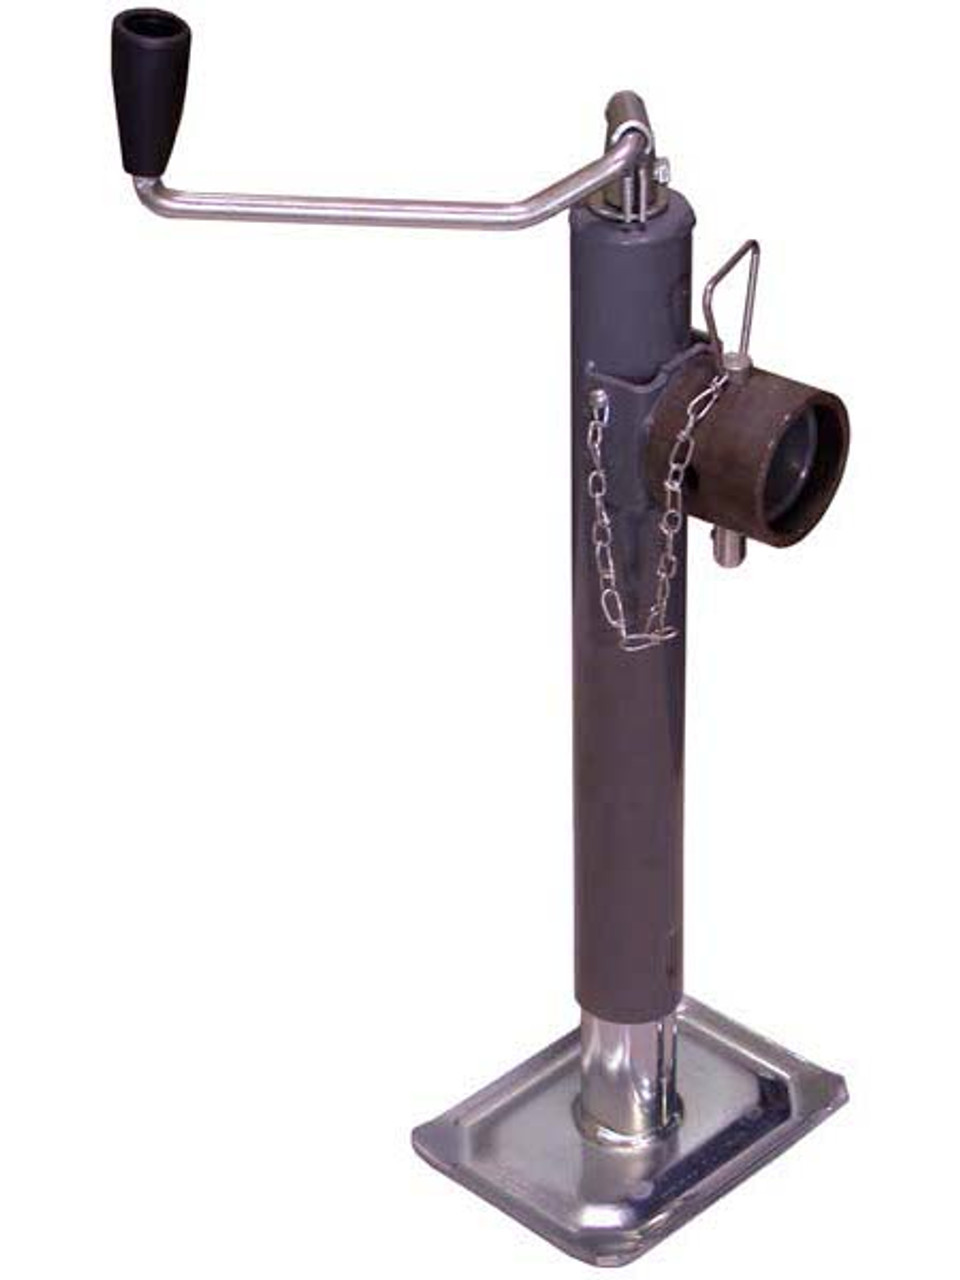 198200 --- BULLDOG Swivel Topwind Trailer Jack - 7,000 lb